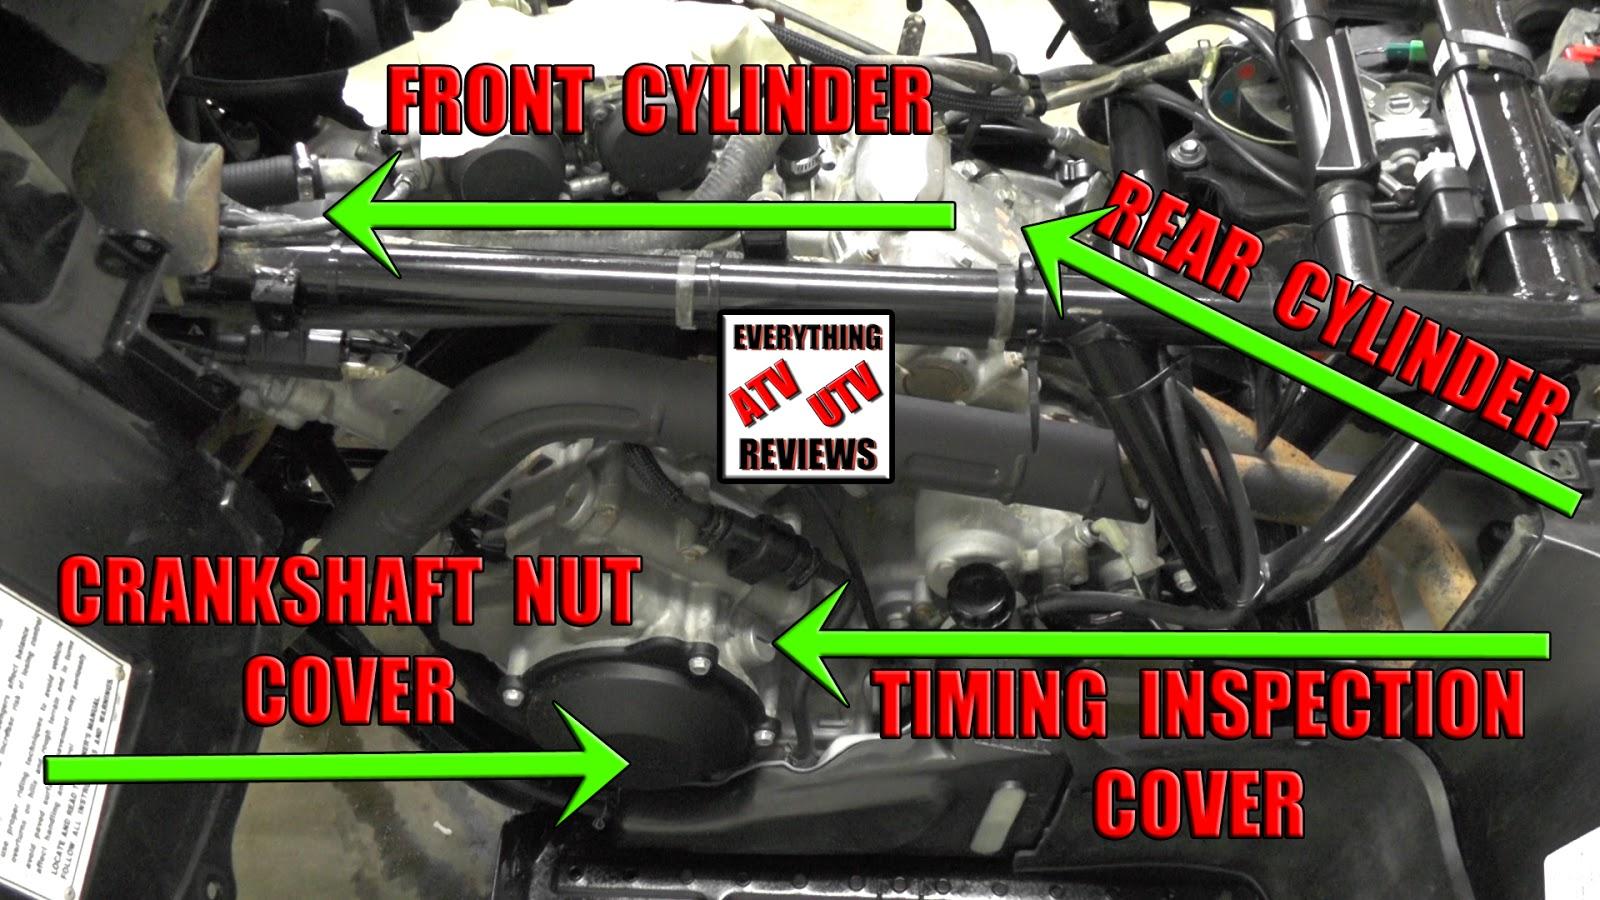 2016 kawasaki brute force 750 wiring diagram 2008 ford f450 trailer everything atv utv reviews how to adjust valves on